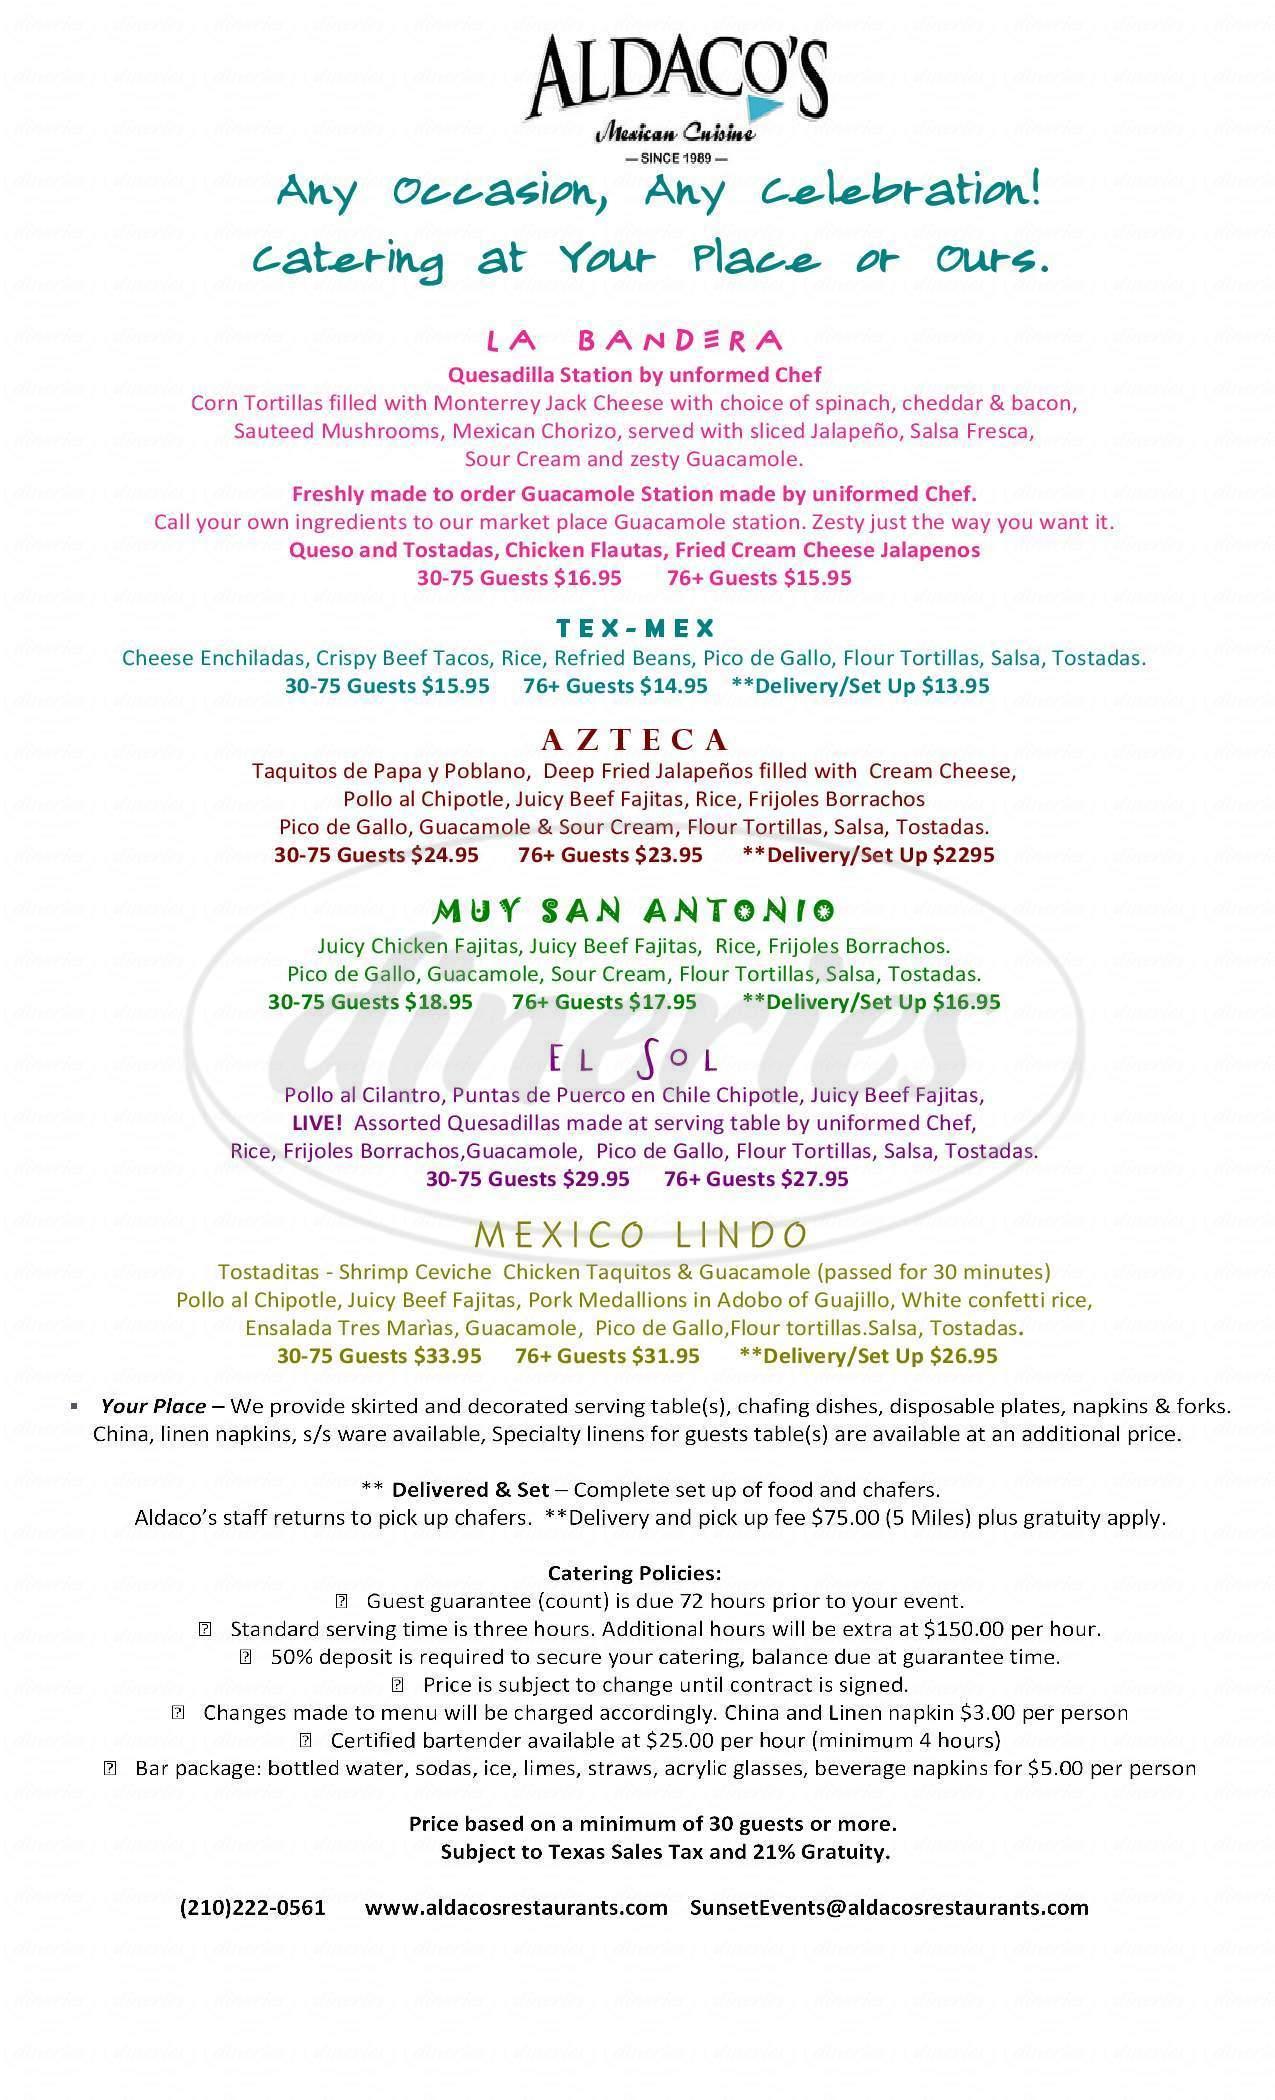 menu for Aldaco's Mexican Cuisine